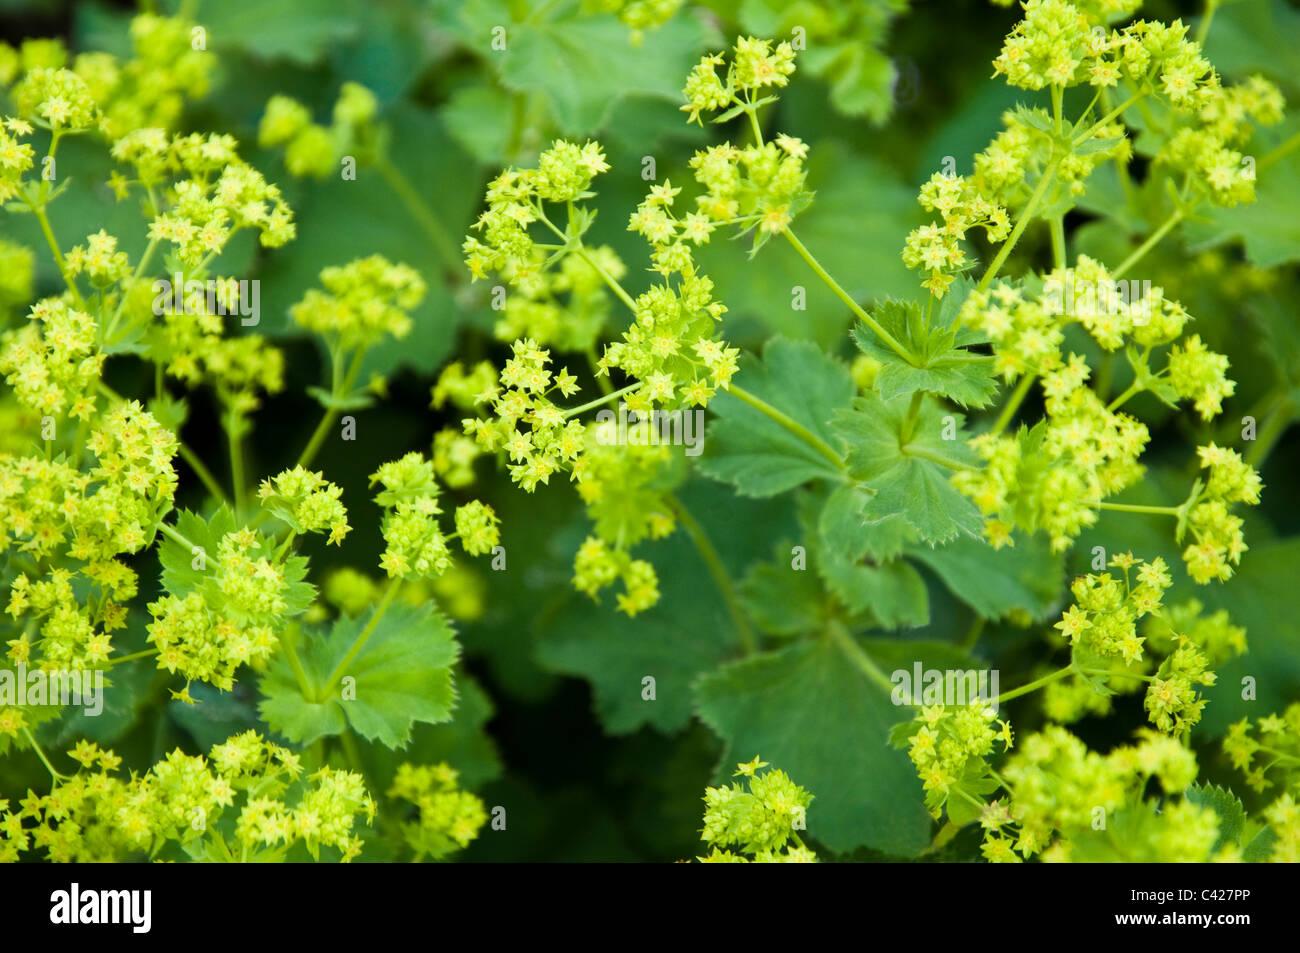 Flowers of the Alchemilla Mollis ( Lady's Mantle ). UK - Stock Image